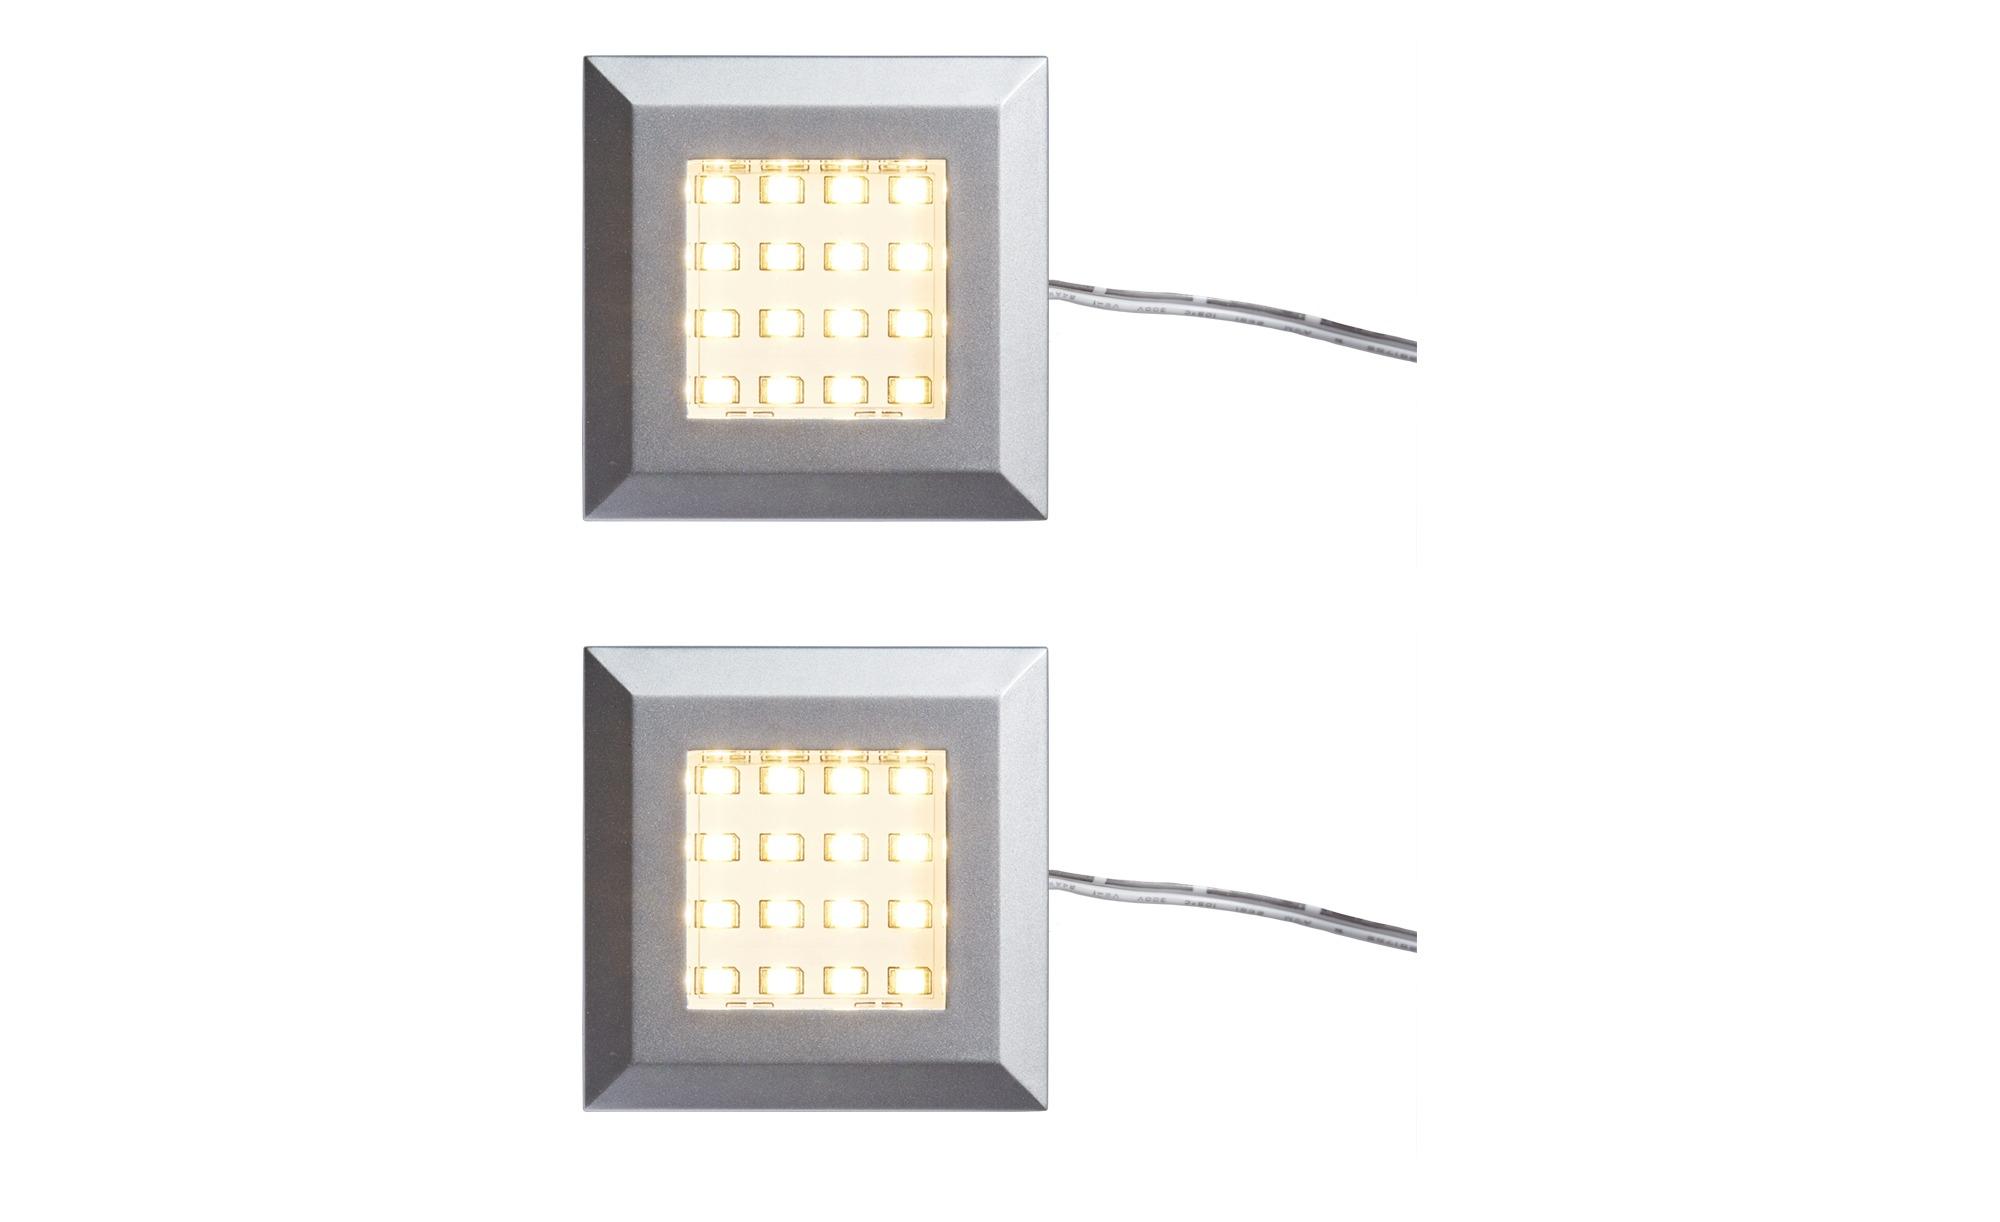 LED-Beleuchtung 'Porto 3000' von Woodford